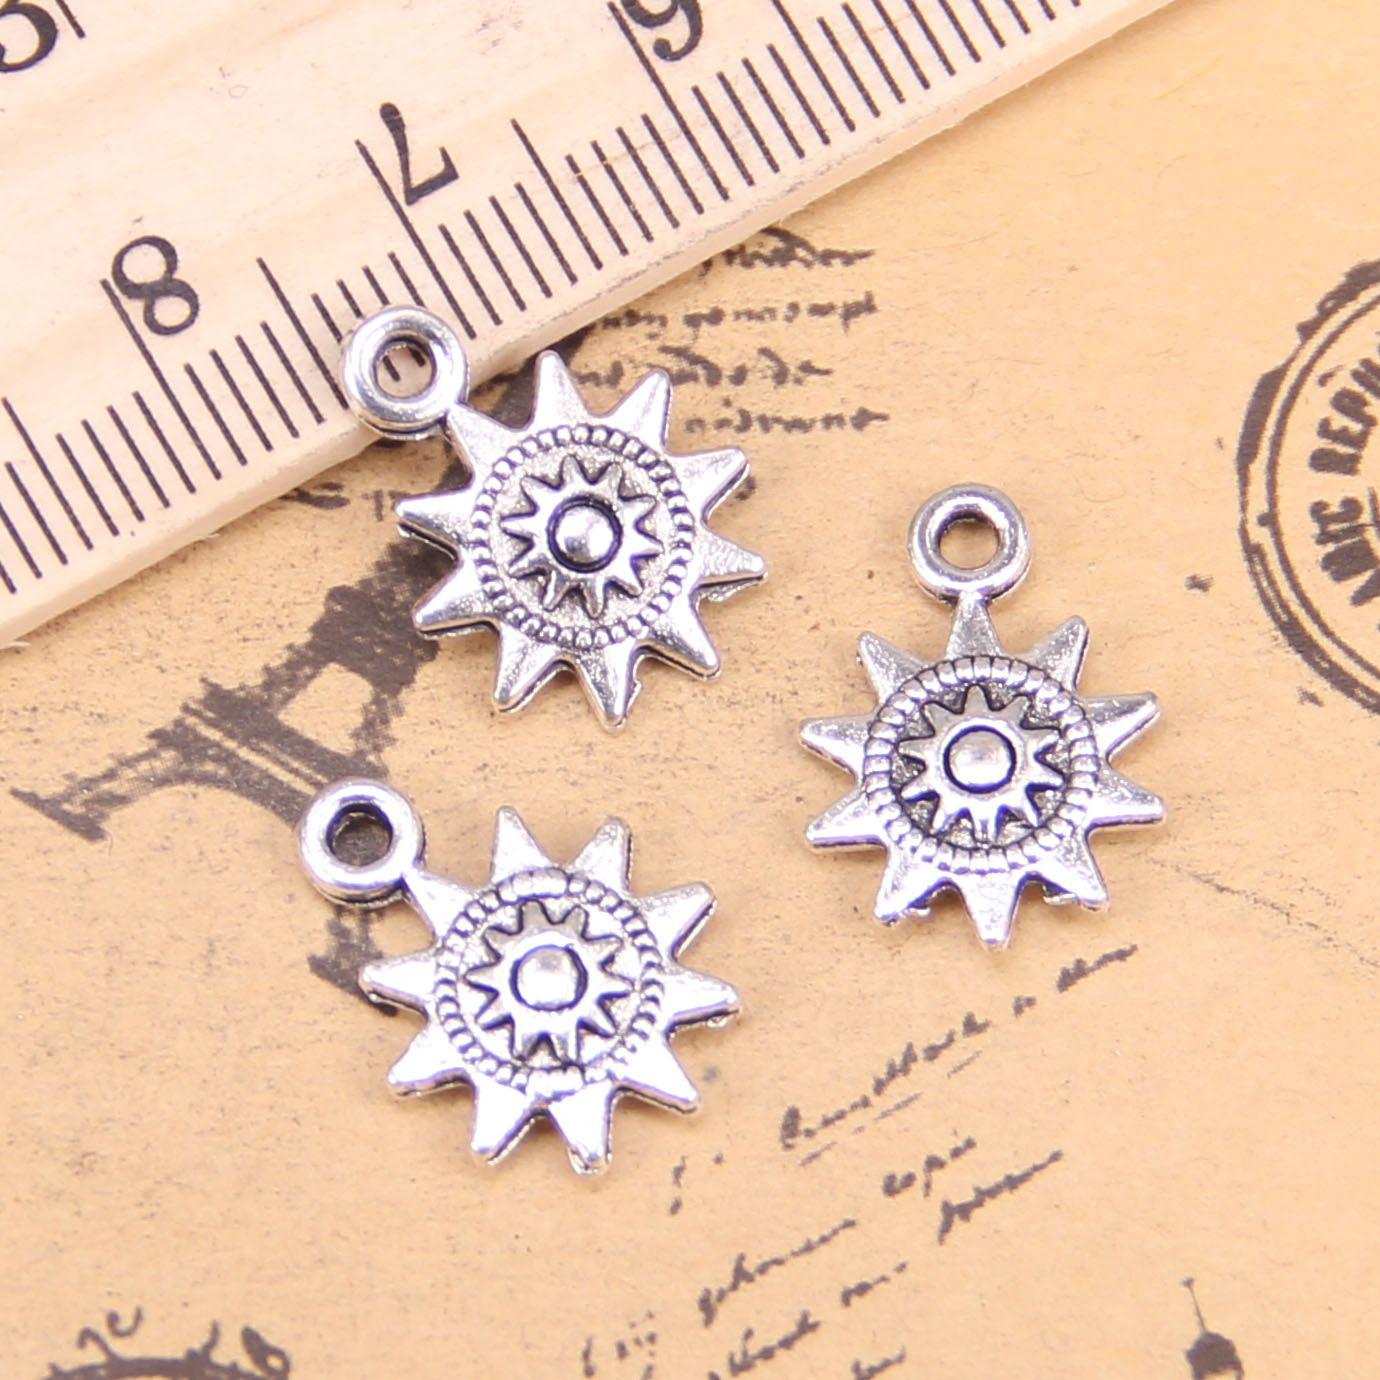 126pcs Jewelry Charms Sun 17x12mm Antiguo Colgantes plateados plateados Haciendo DIY Joyería de plata tibetana hecha a mano